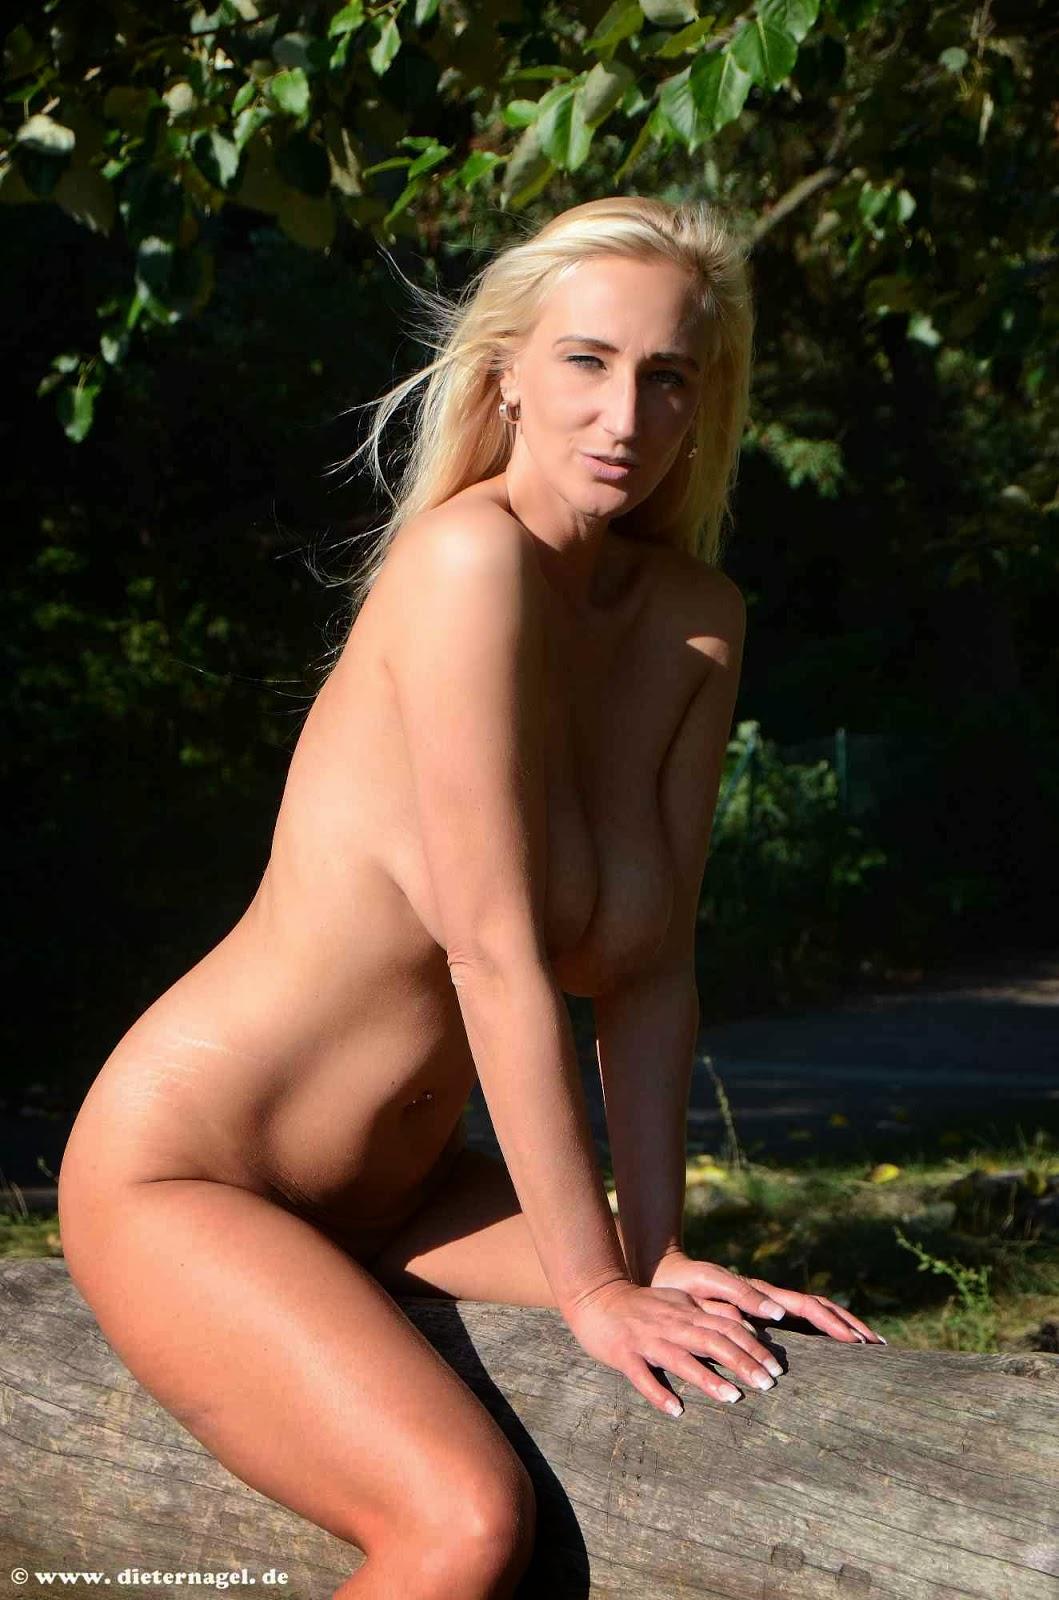 kathrine sørland nude escort massasje